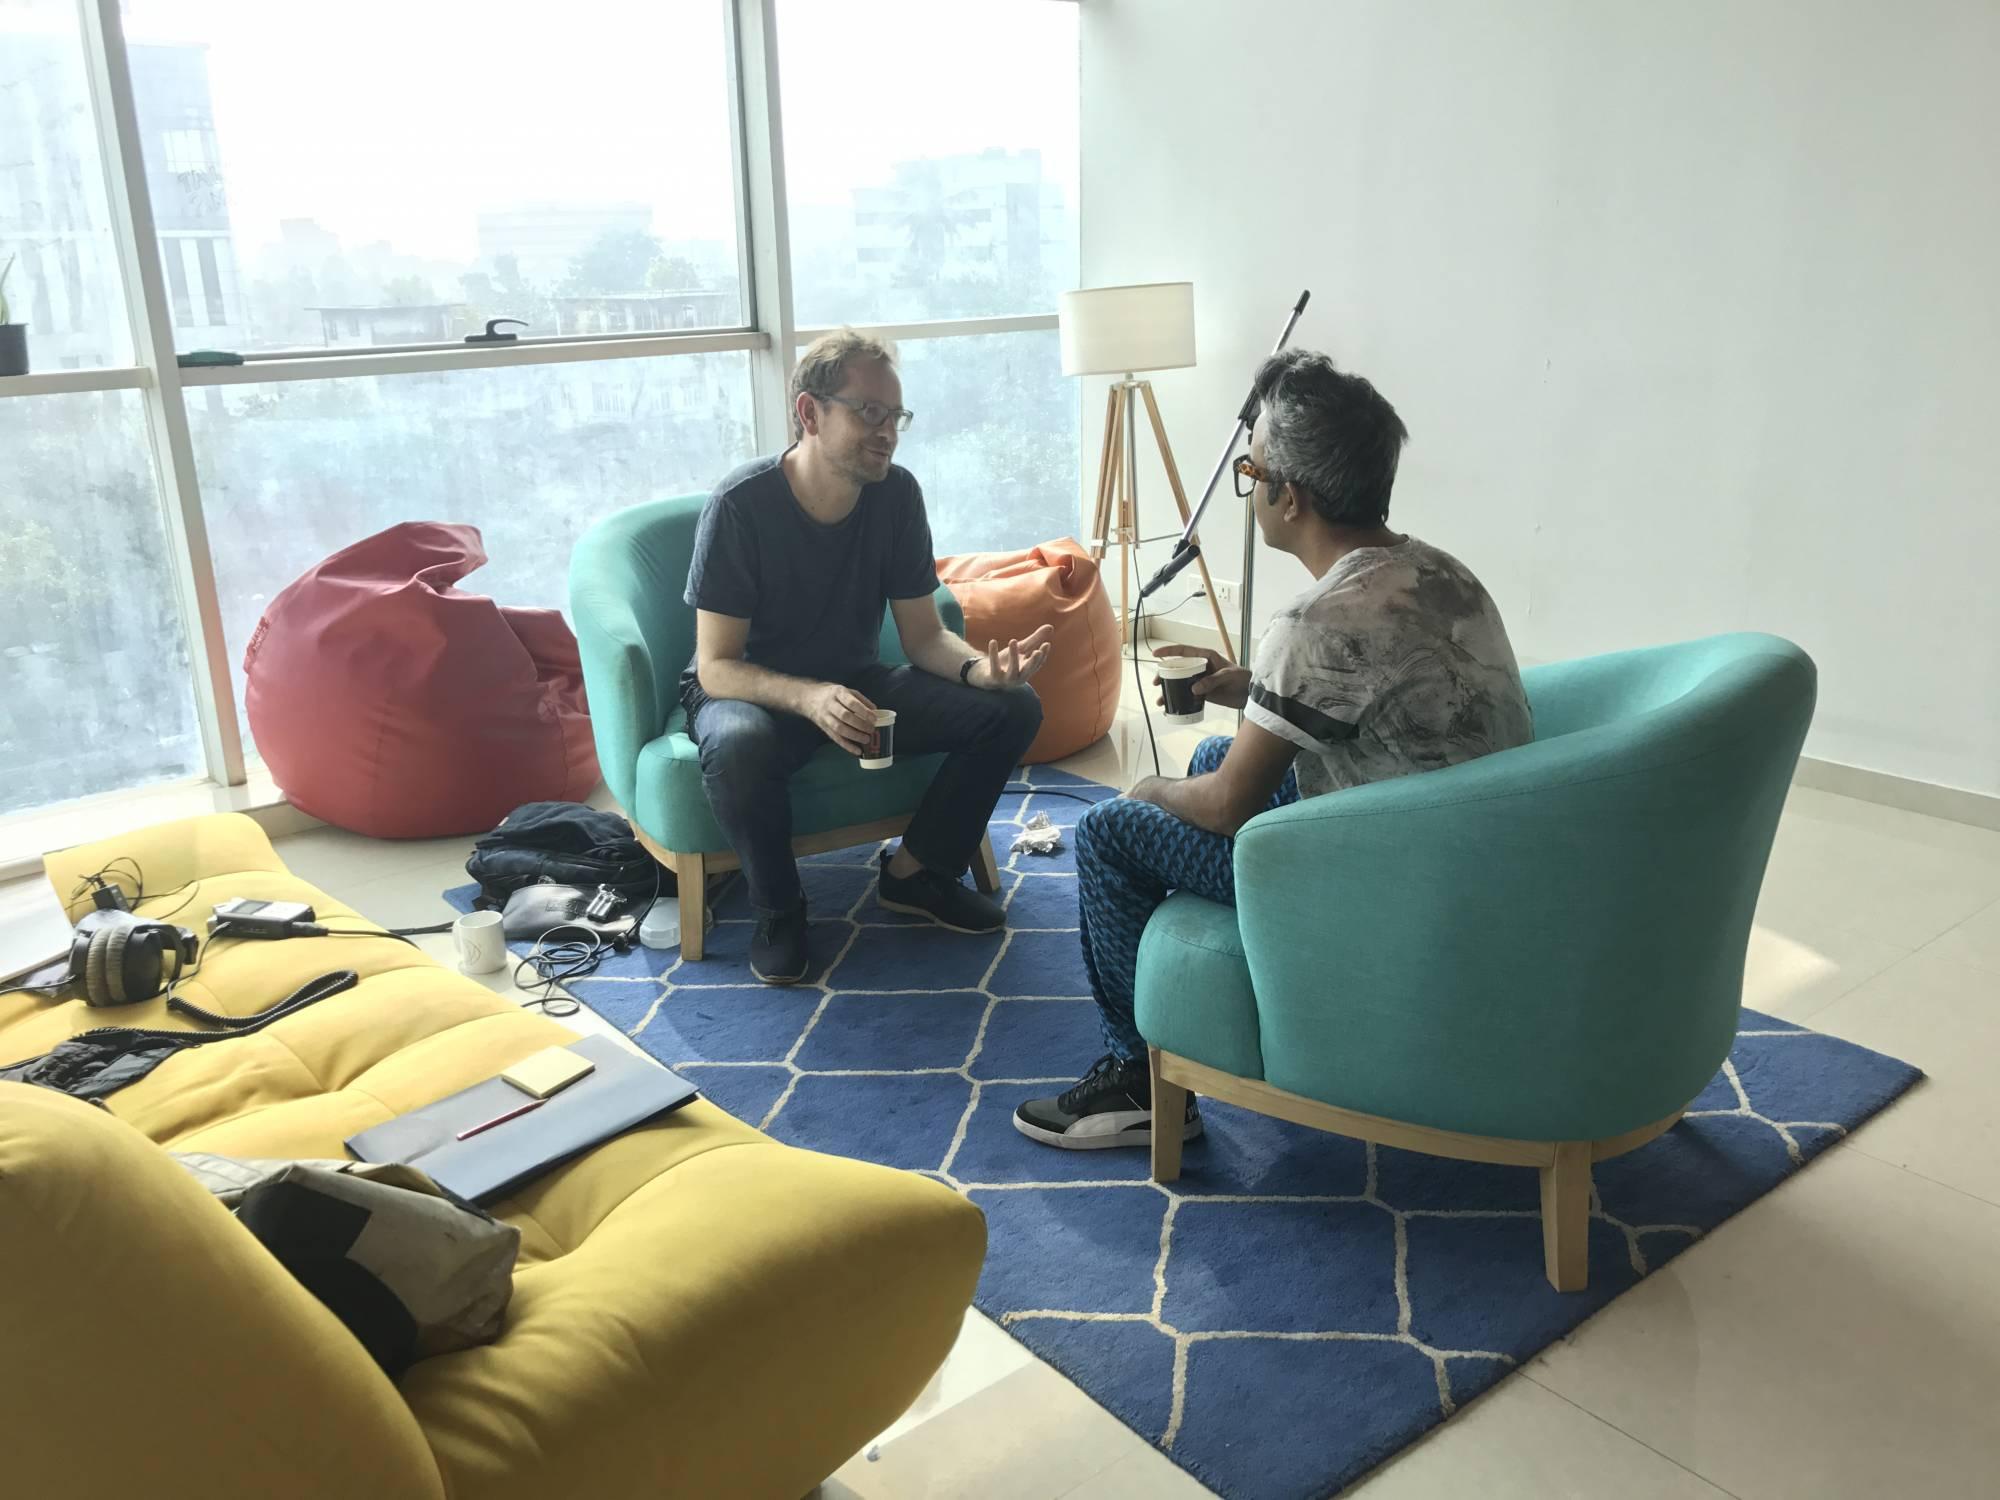 Mats Staub in conversation with Shazeb Shaikh in his office in Mumbai, December 2017 (Image: Peter Schürmann)